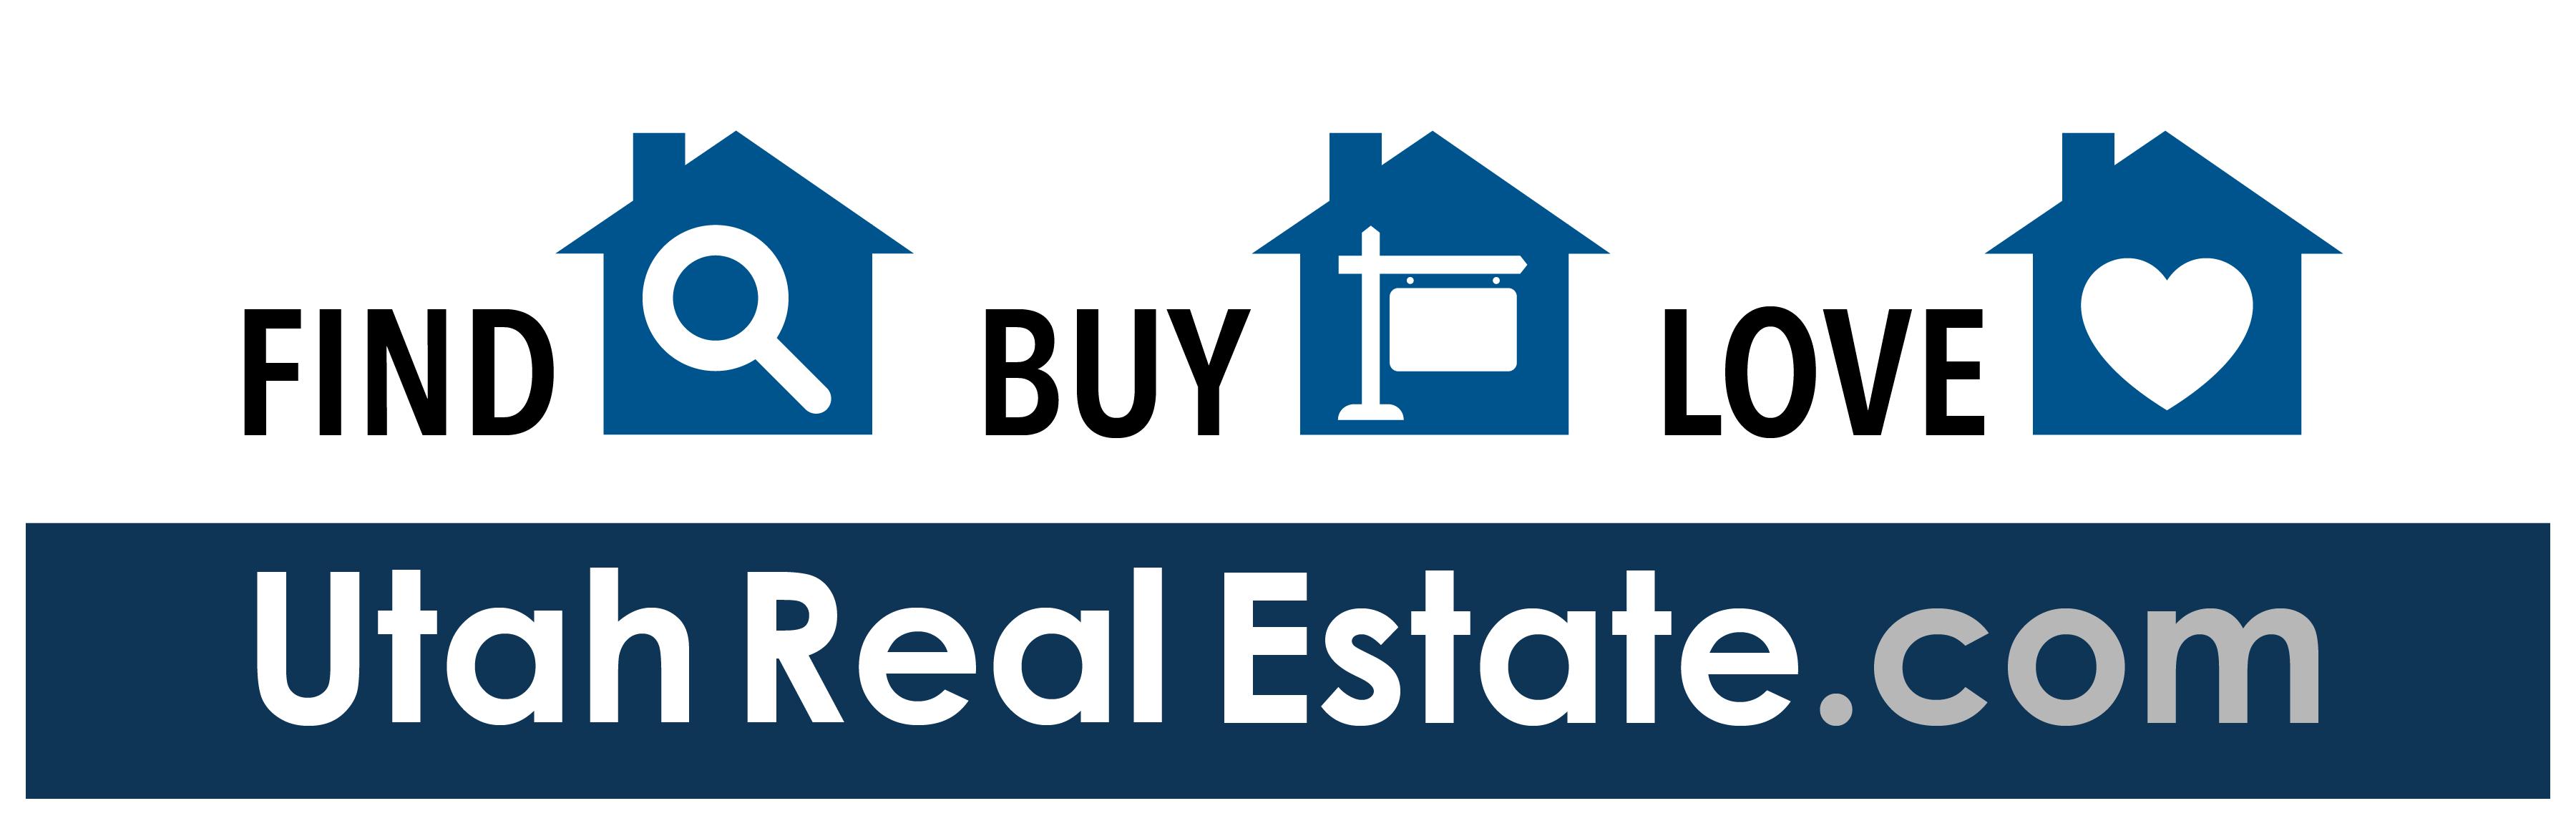 Find Buy Love - UtahRealEstate.com